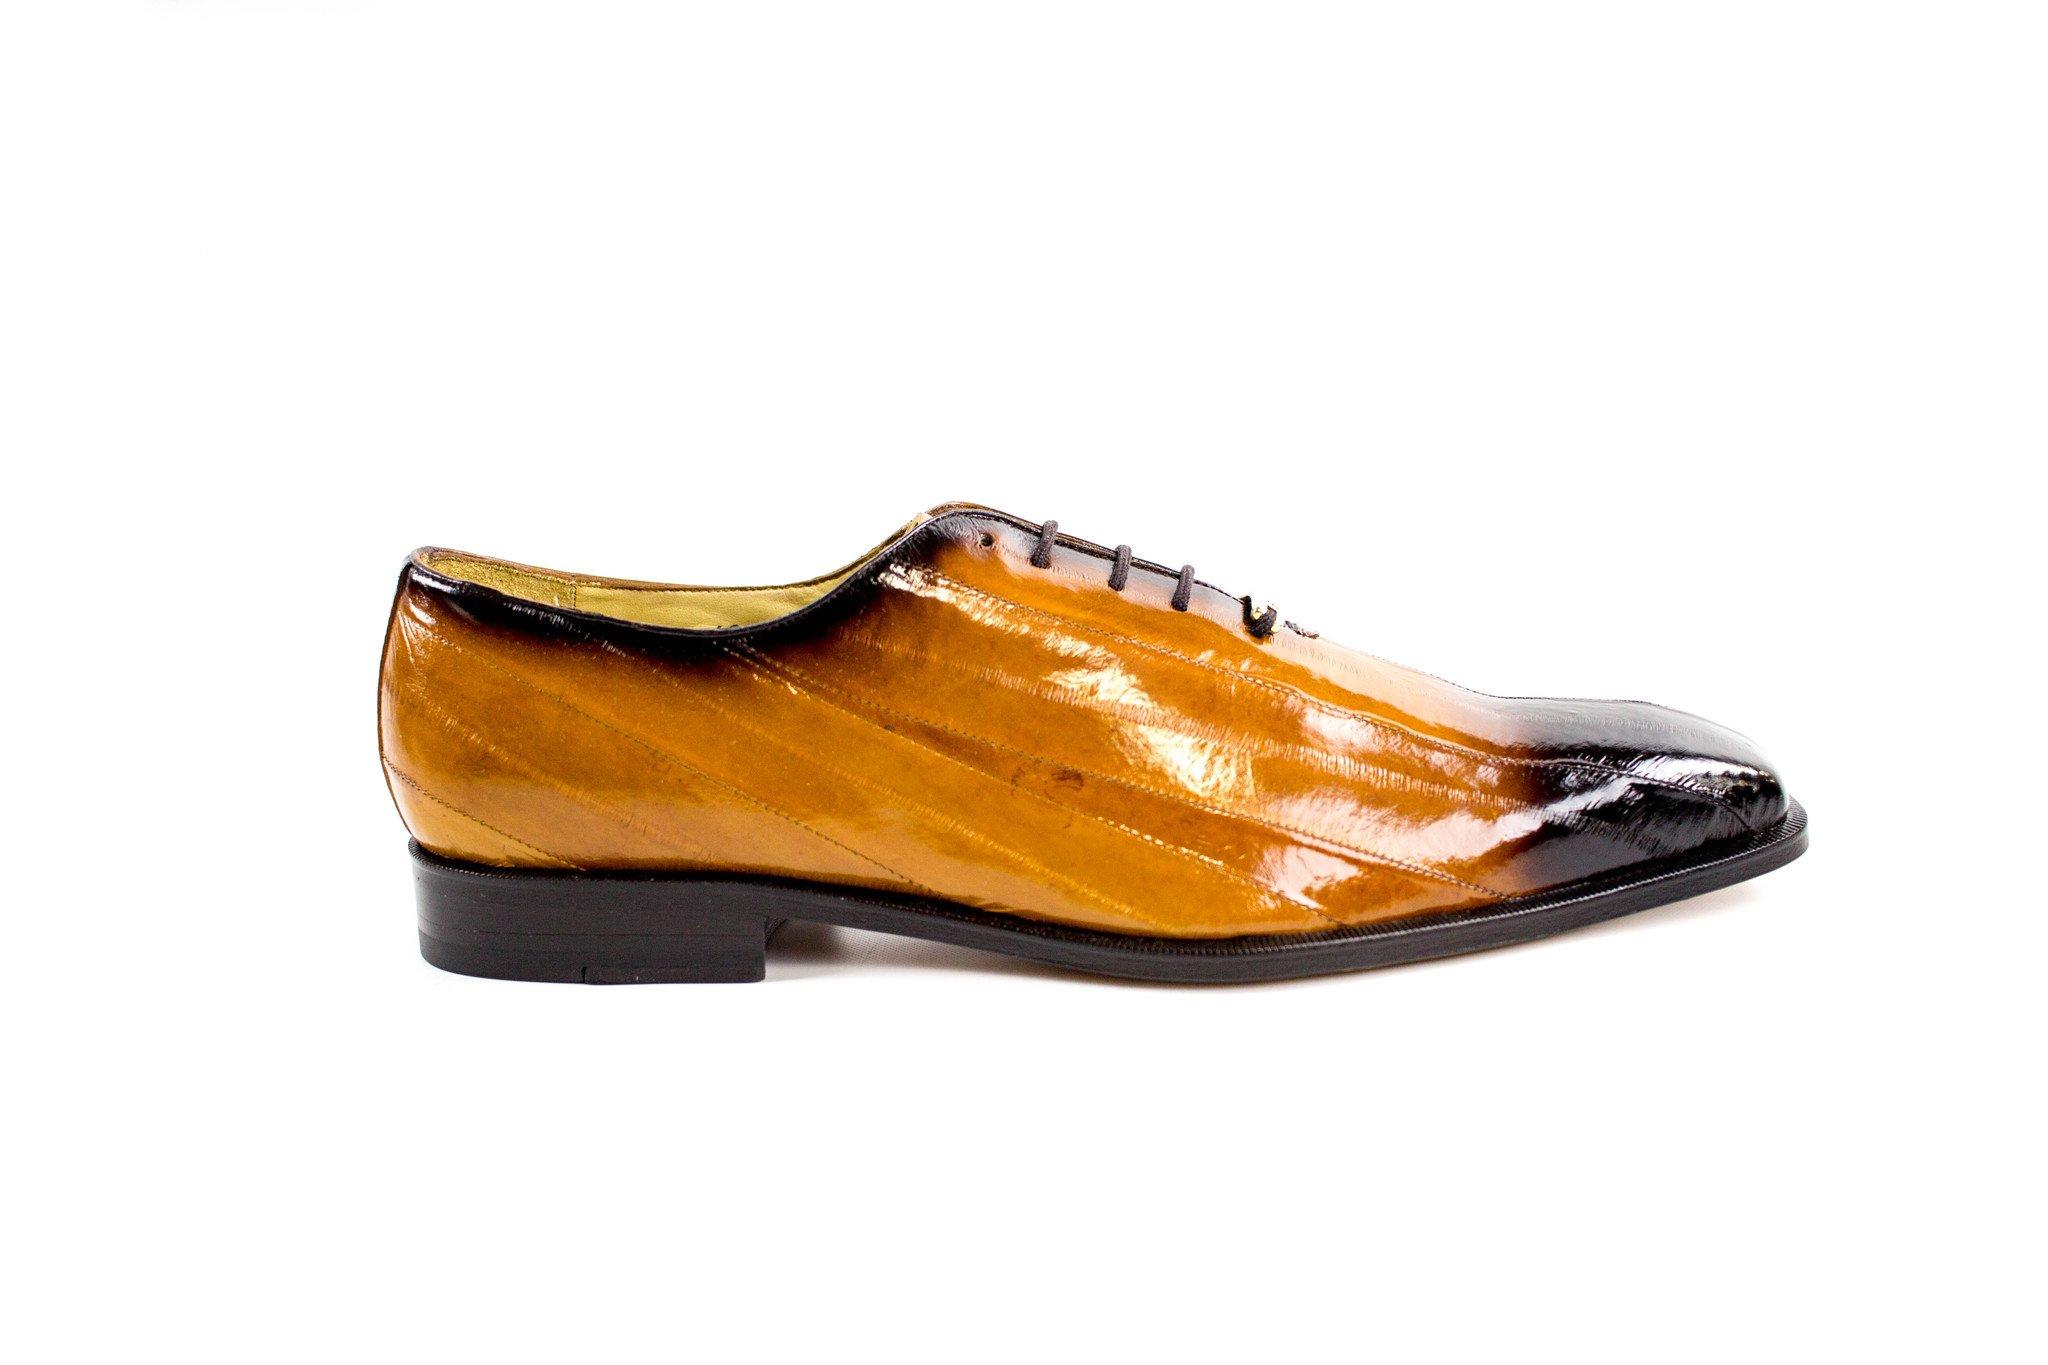 Belvedere Stella Antique All-Over Genuine Eel Oxford Shoes (9.5M, Antique Camel) by Belvedere (Image #1)